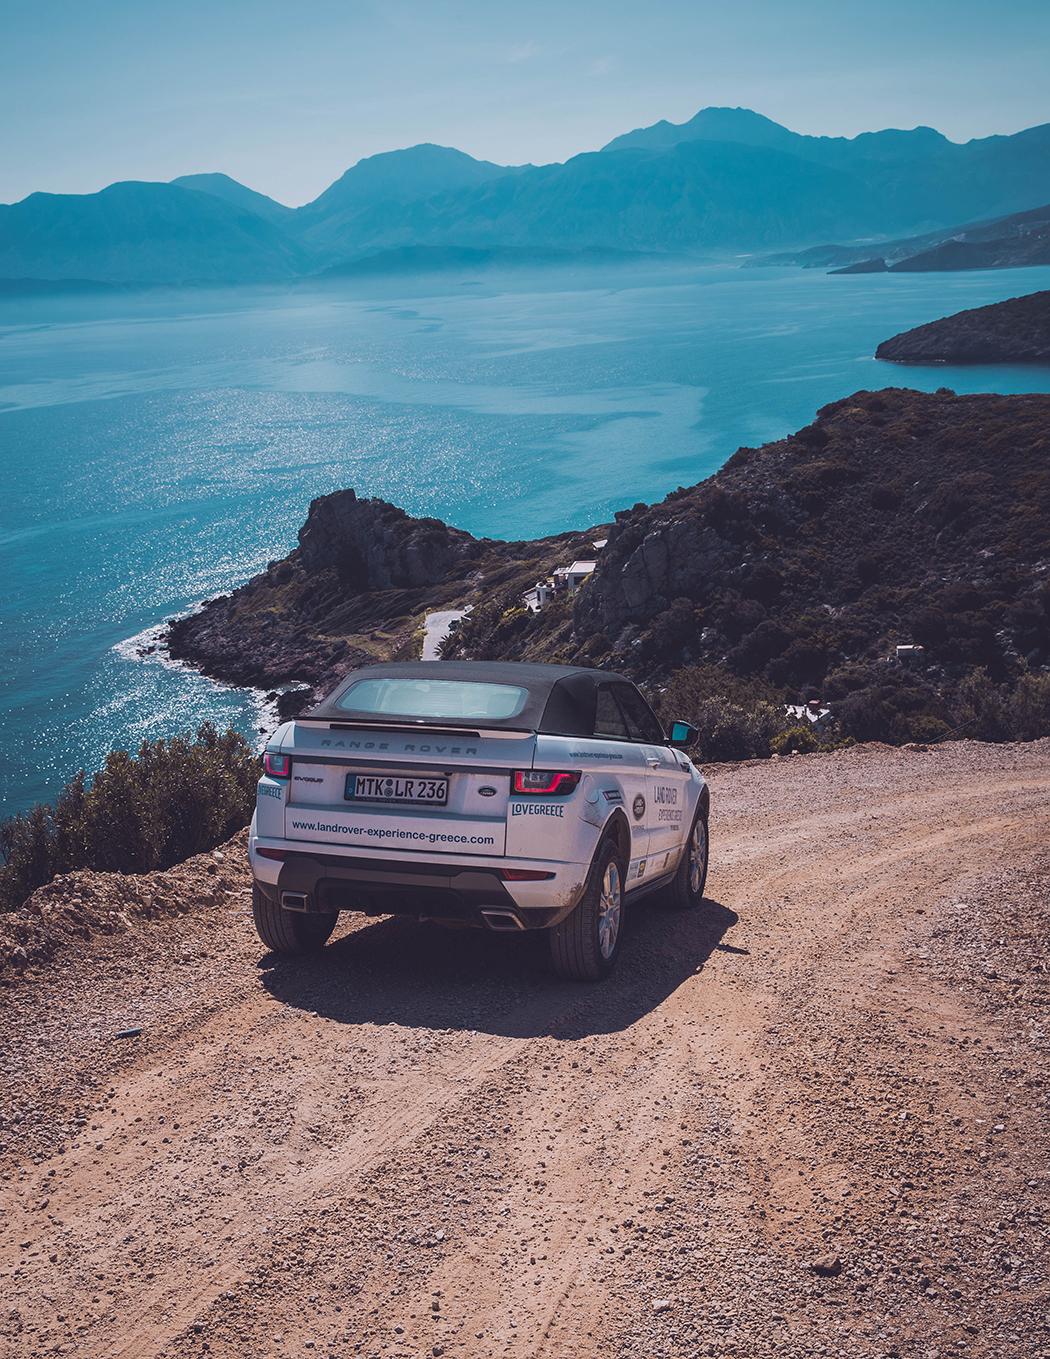 Travelblog-Travelblogger-Travel-Blog-Blogger-Muenchen-Deutschland-Kreta-Land_Rover-Experience-Kreta-Daios_Cove-Hotel-Lindarella-17-web